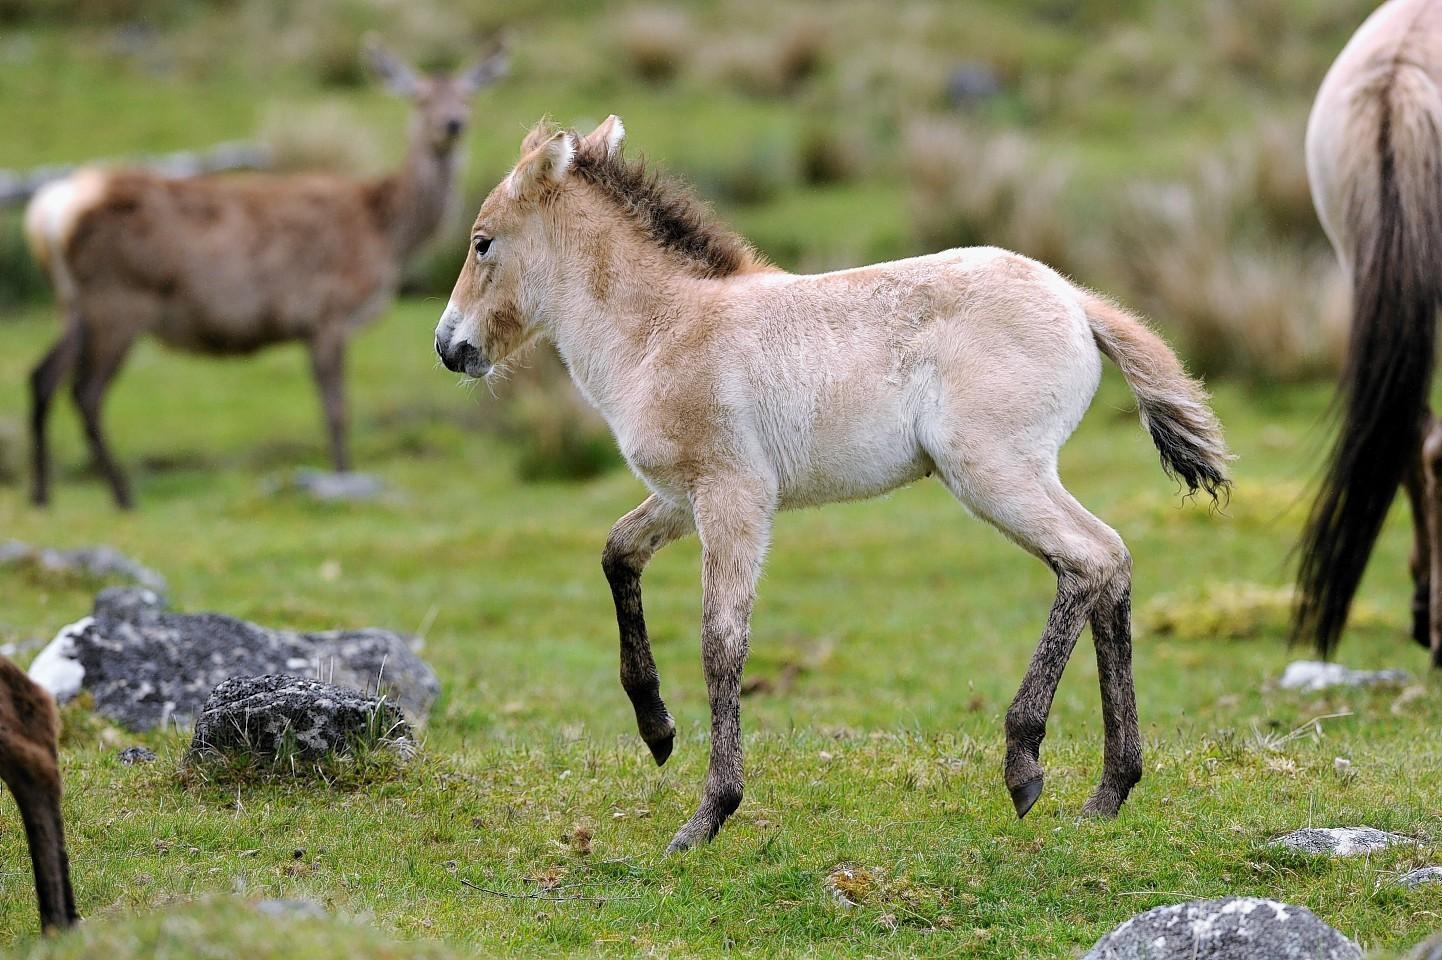 The newborn Przewalski's foal